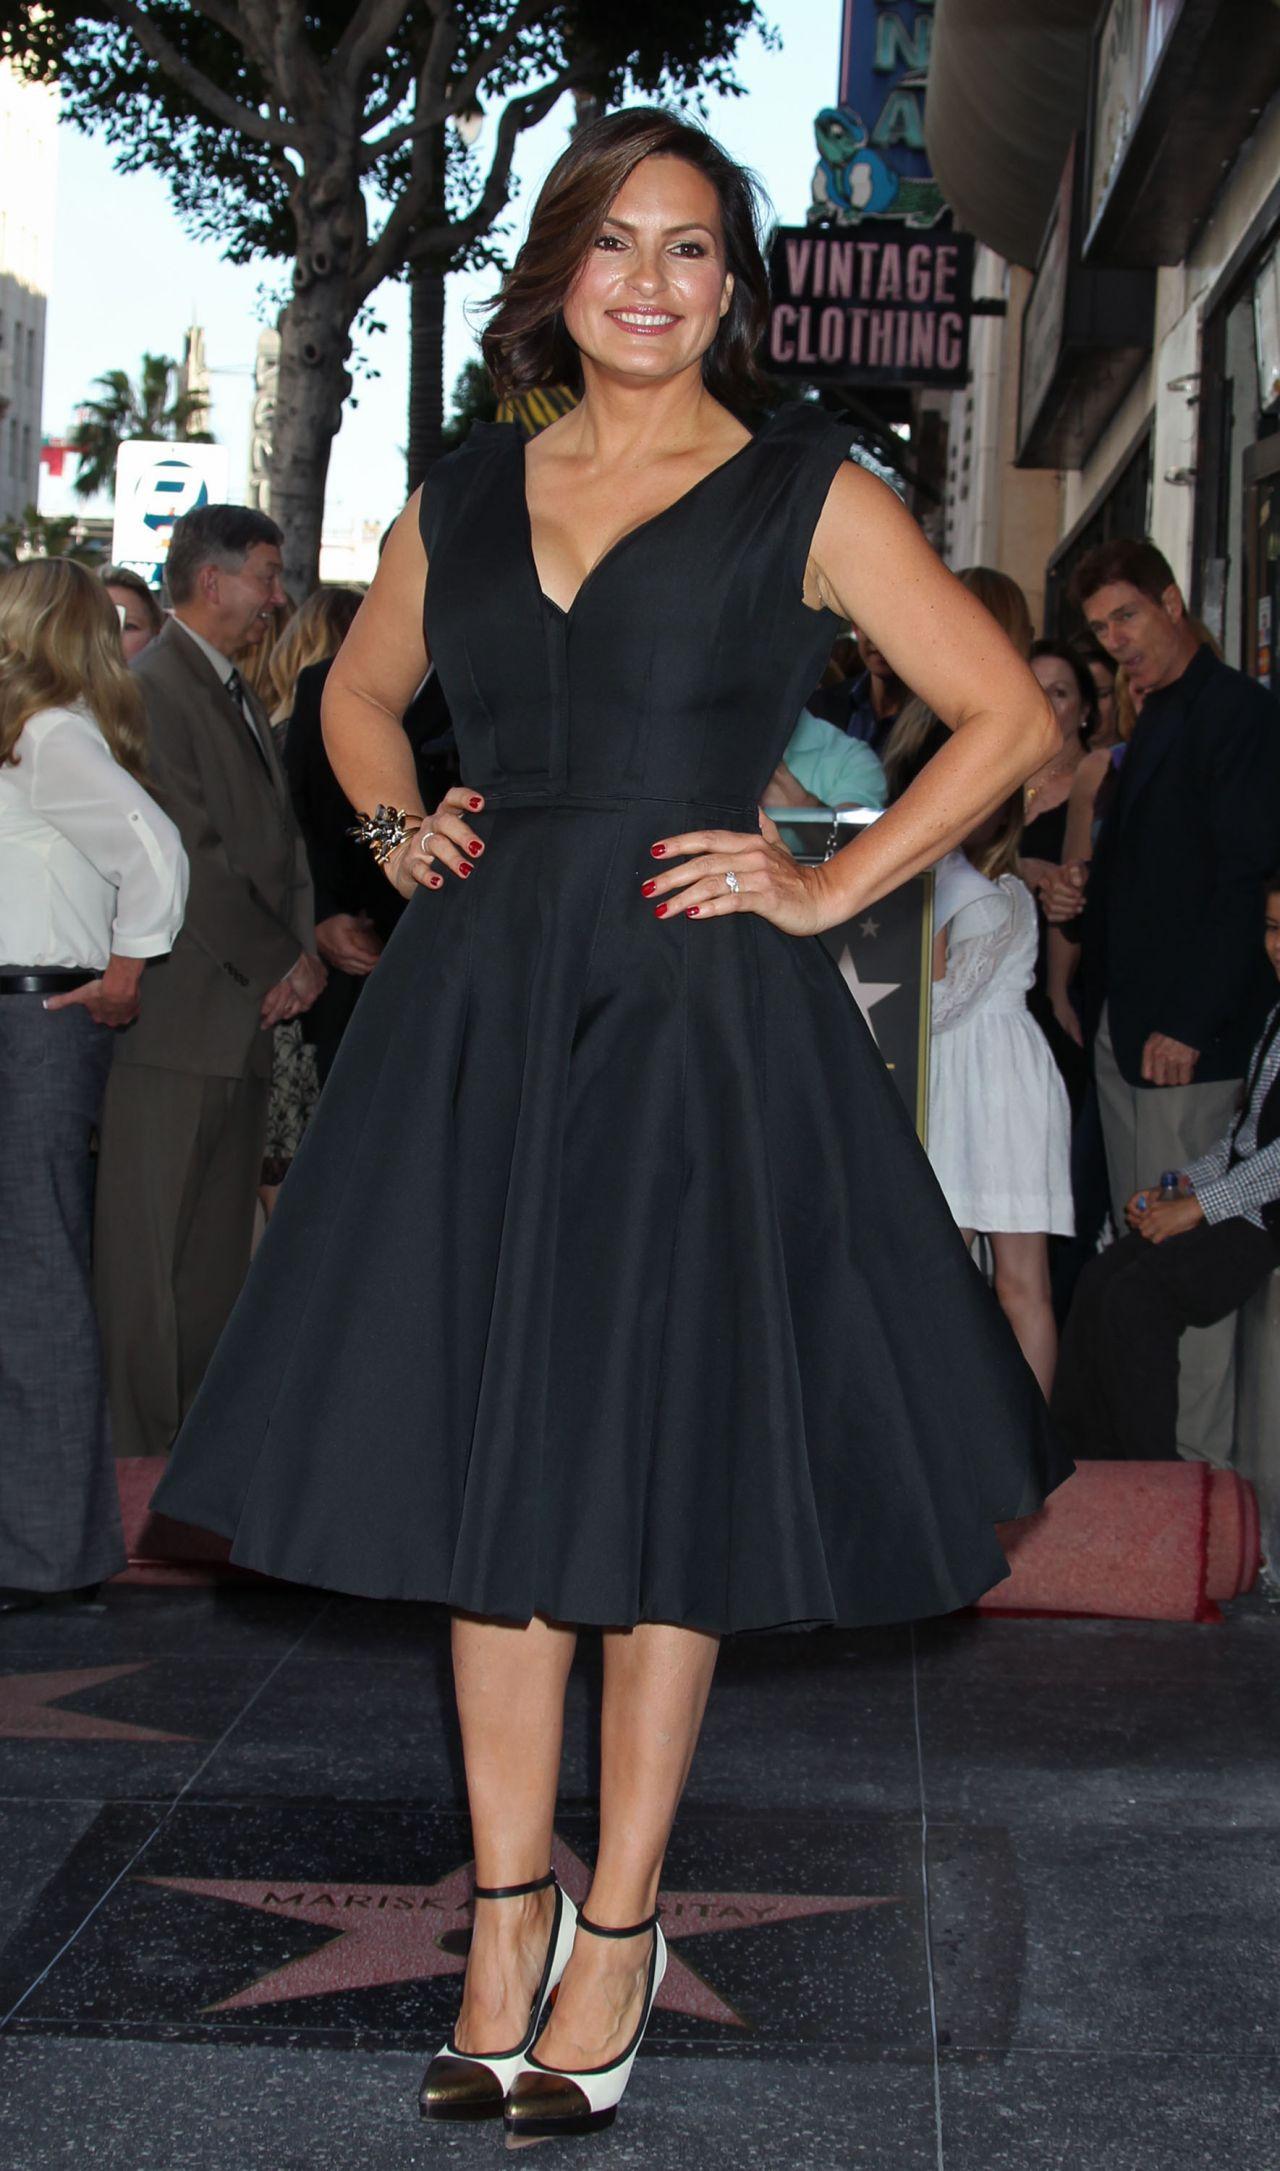 Mariska Hargitay Honored With A Star On The Hollywood Walk